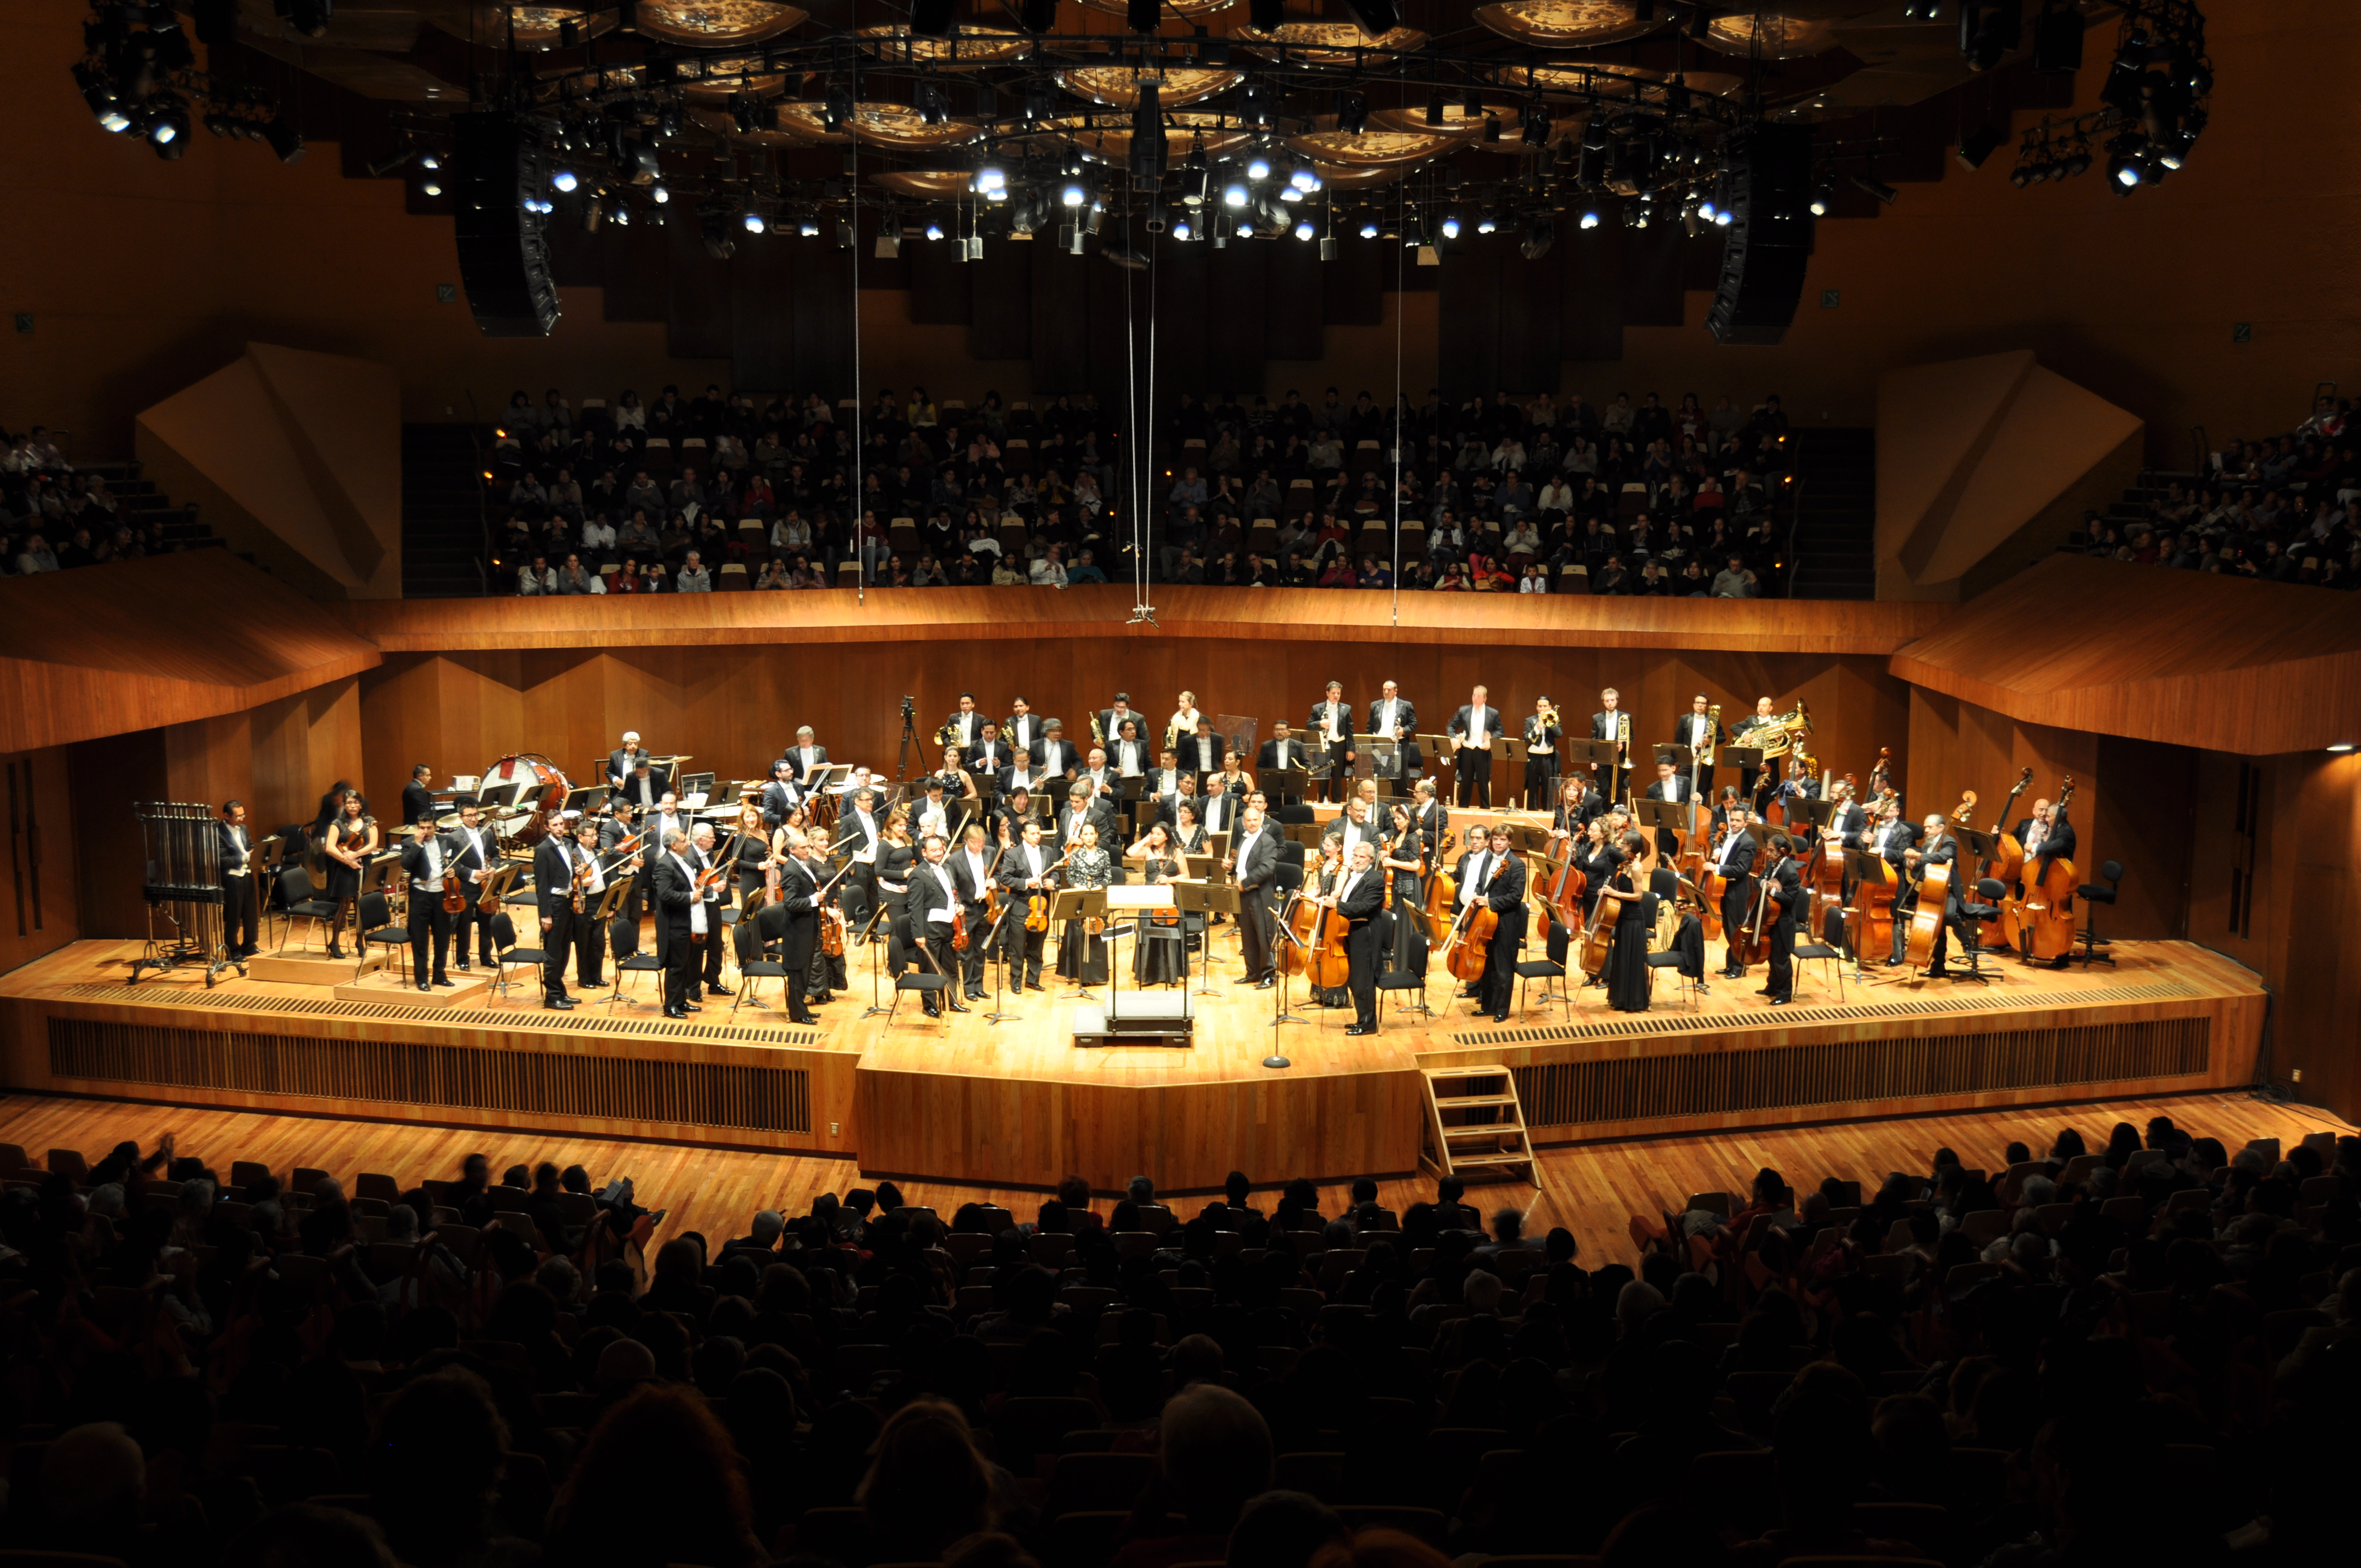 Tales from the Underground, Theatro Municipal de Sao Paulo, Conductor John Neschling, Saturday , February 7th, 2015 [Reply Sunday, February 8th, 2015]